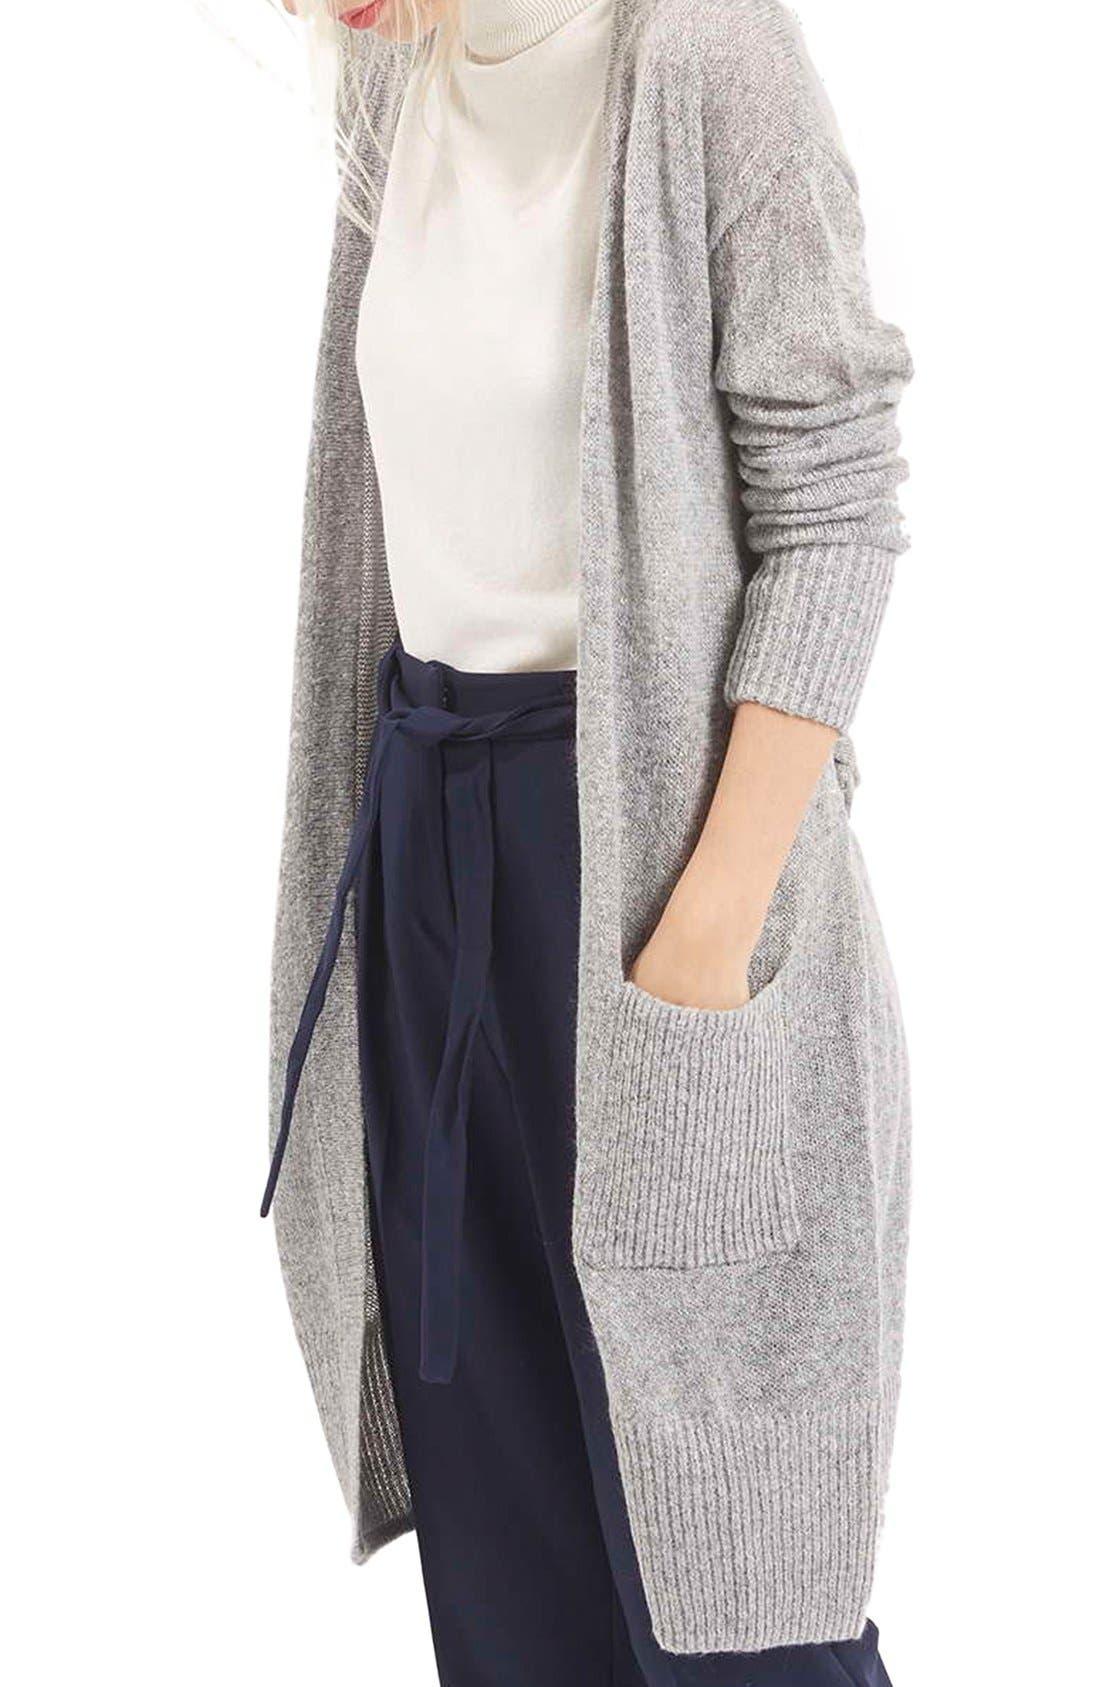 'Lulu' Belted Longline Cardigan,                             Main thumbnail 1, color,                             Light Grey